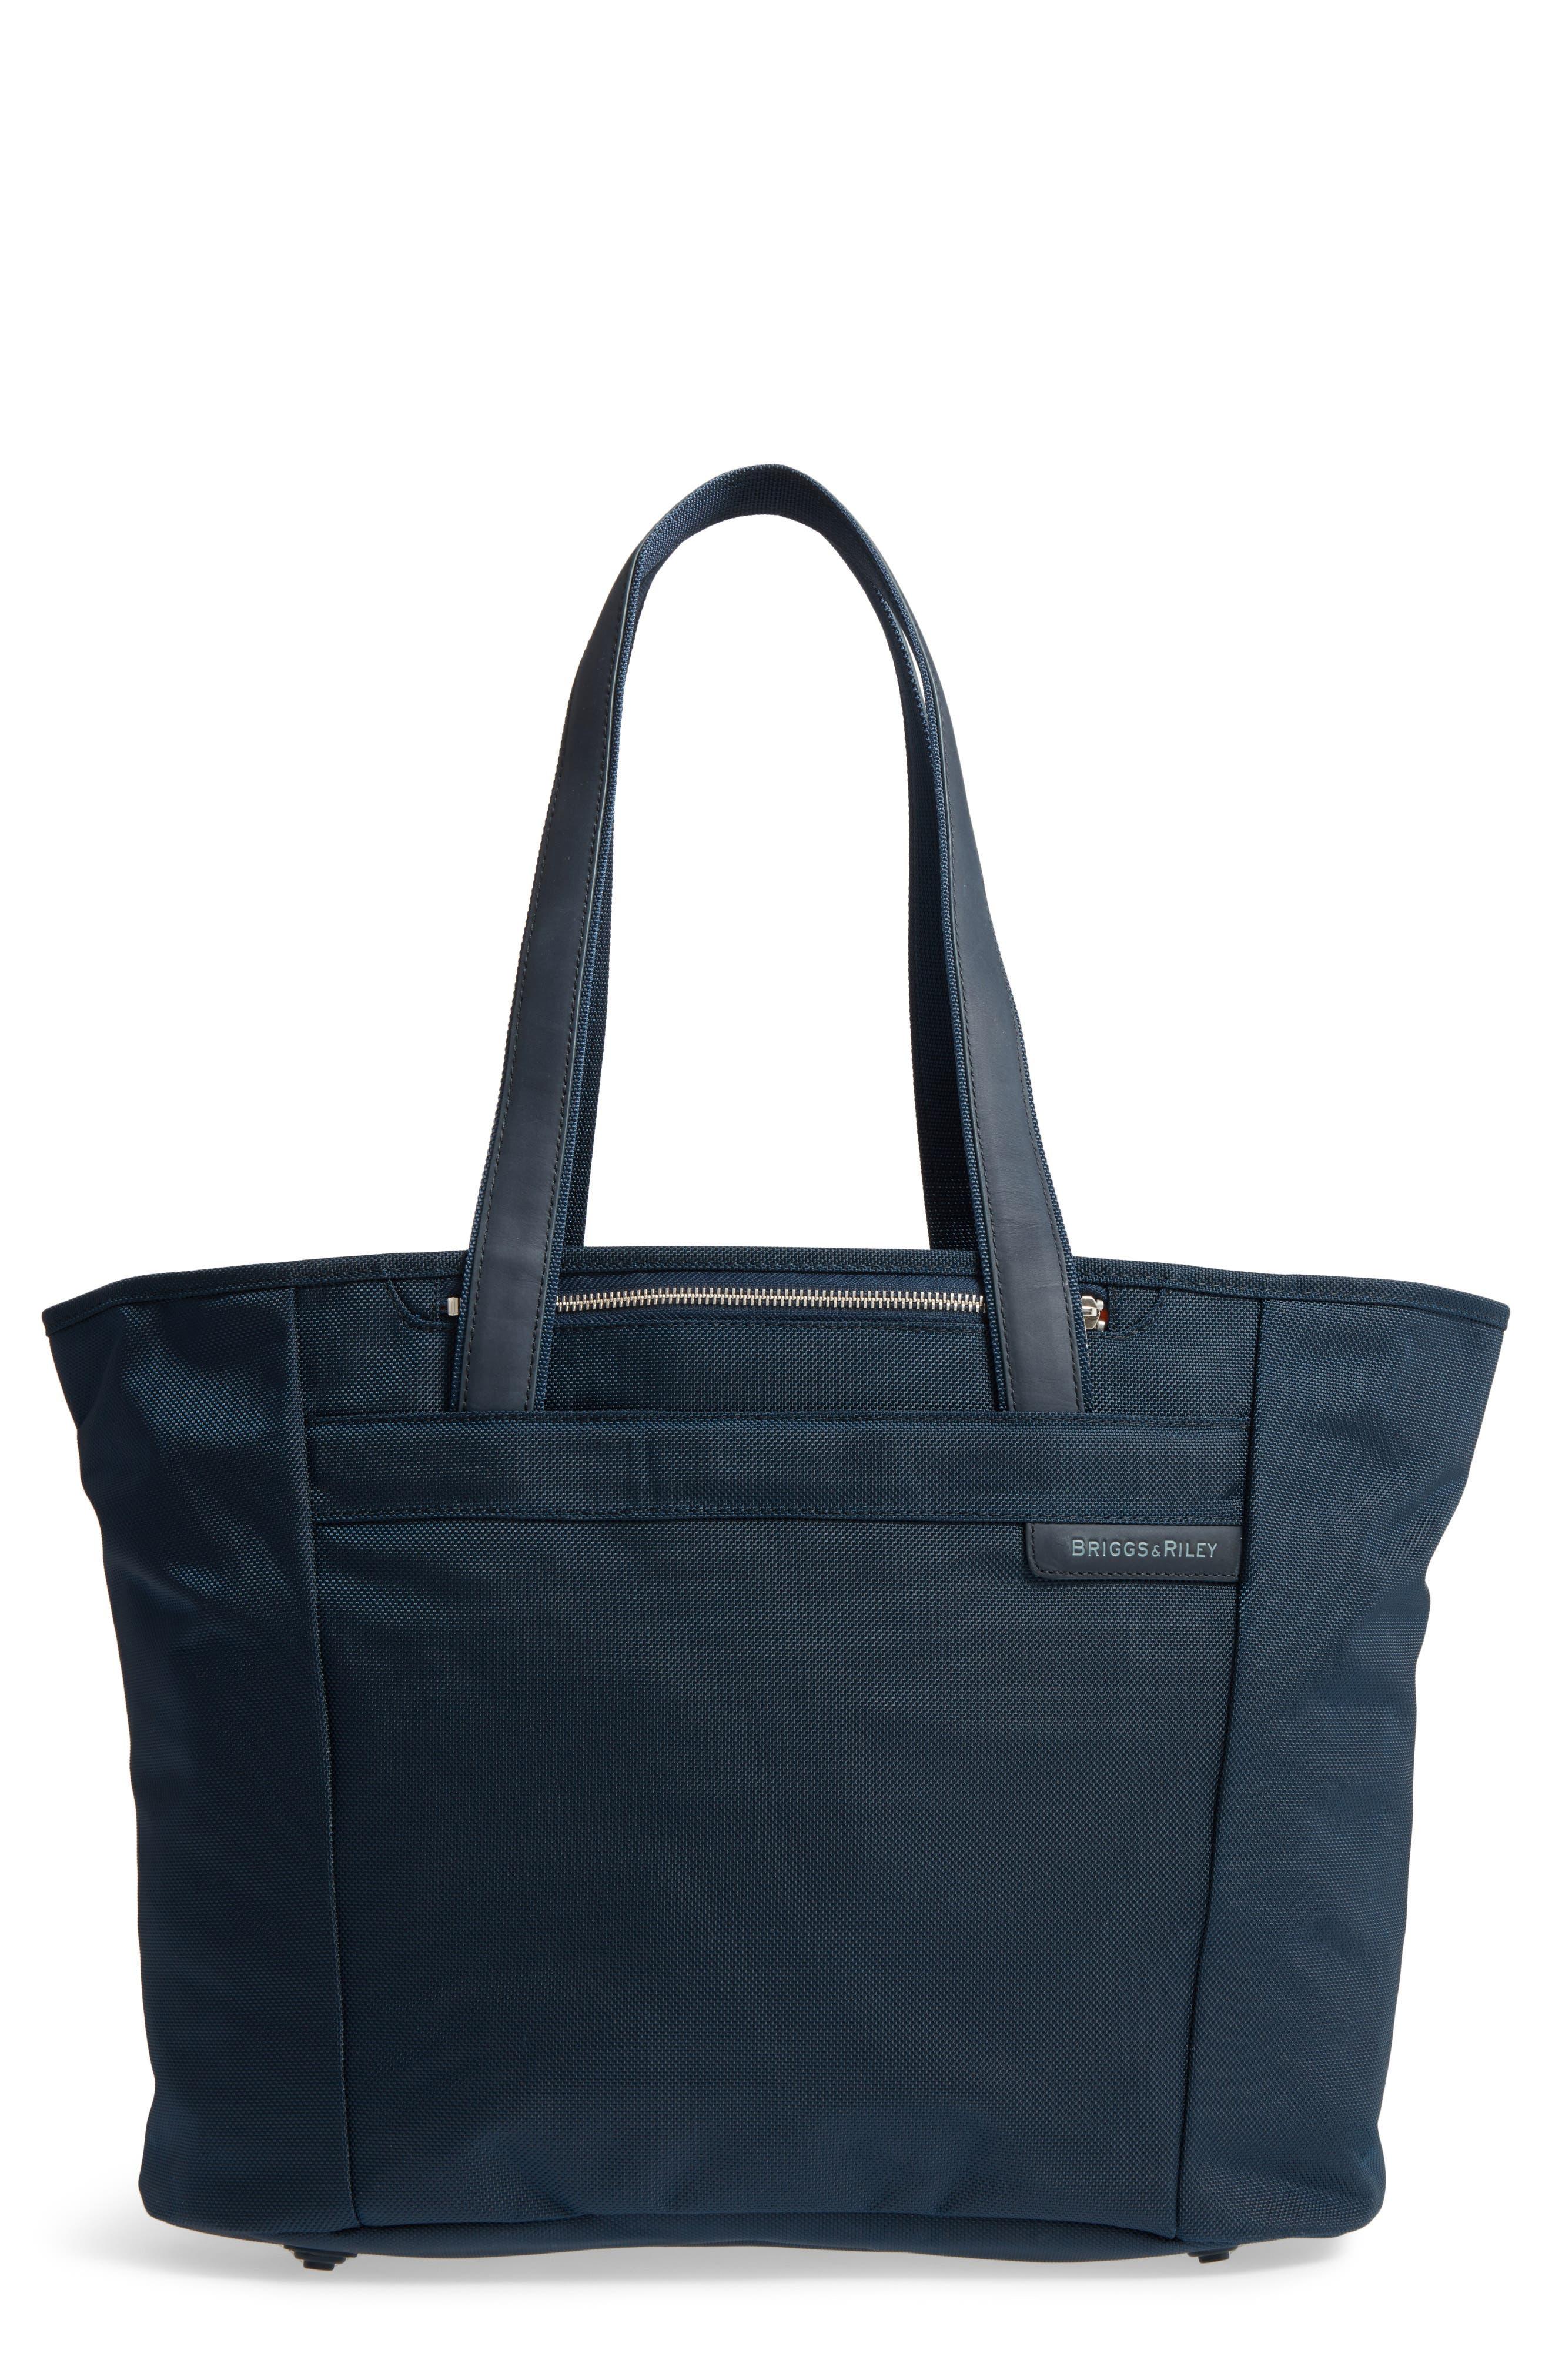 Alternate Image 1 Selected - Briggs & Riley Ltd. Edition Tote Bag